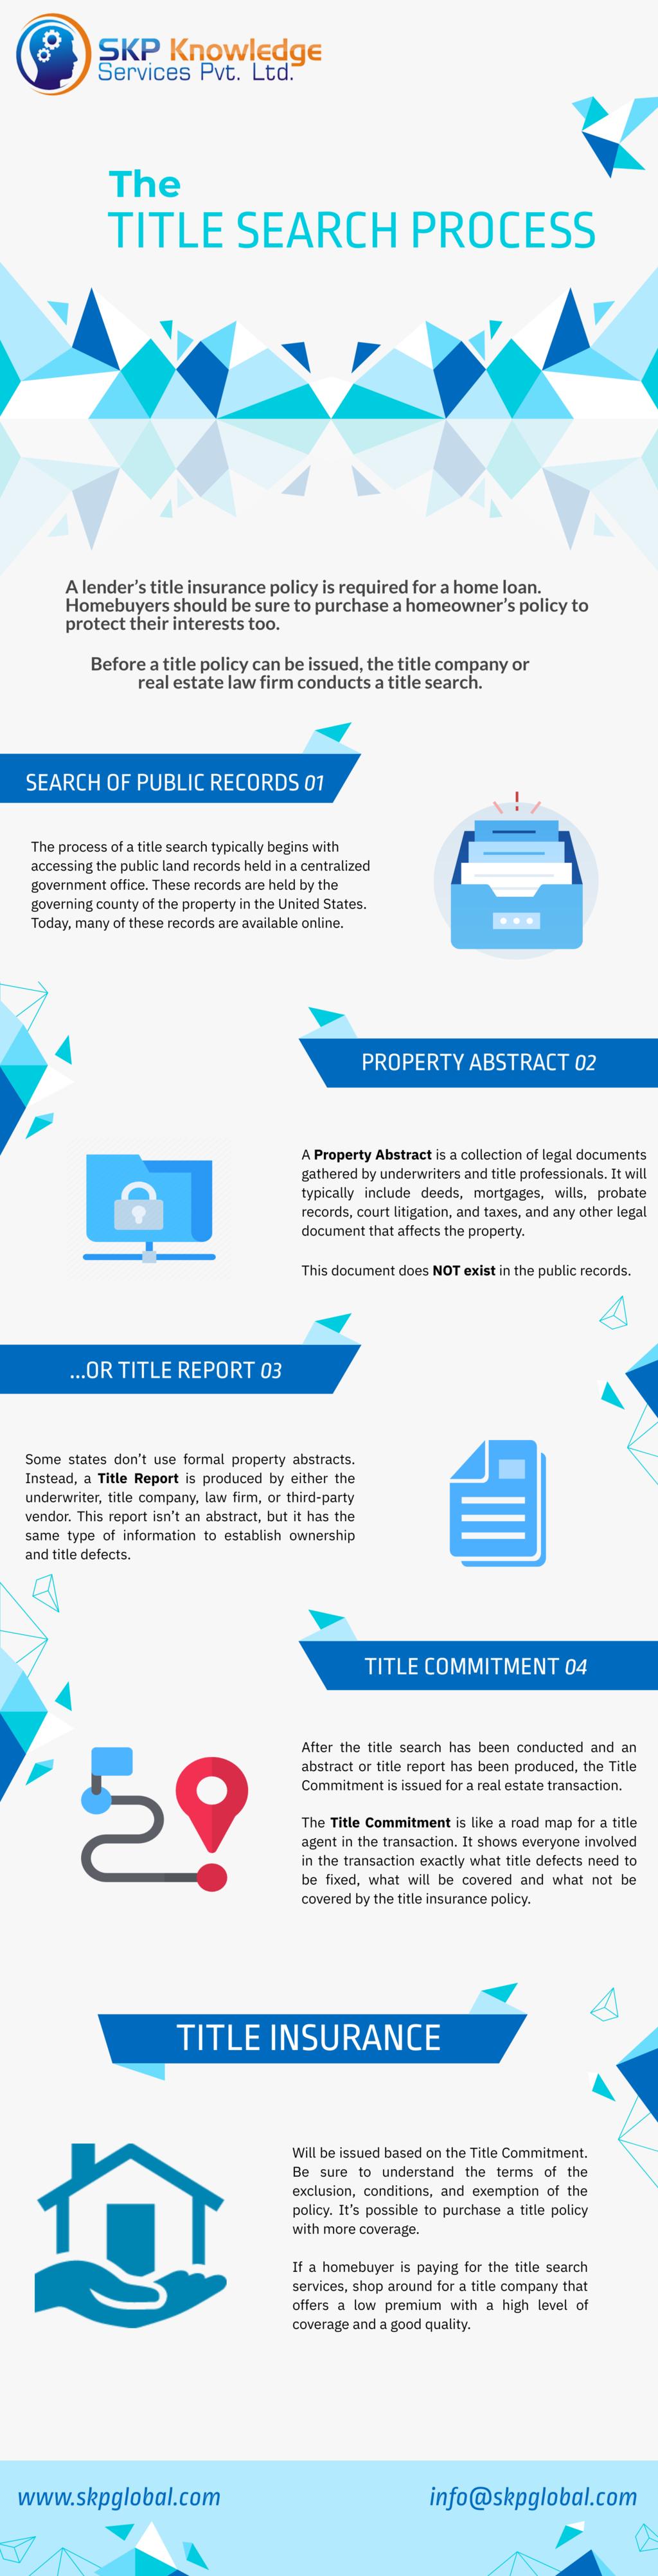 Title Search Process via SKP Global